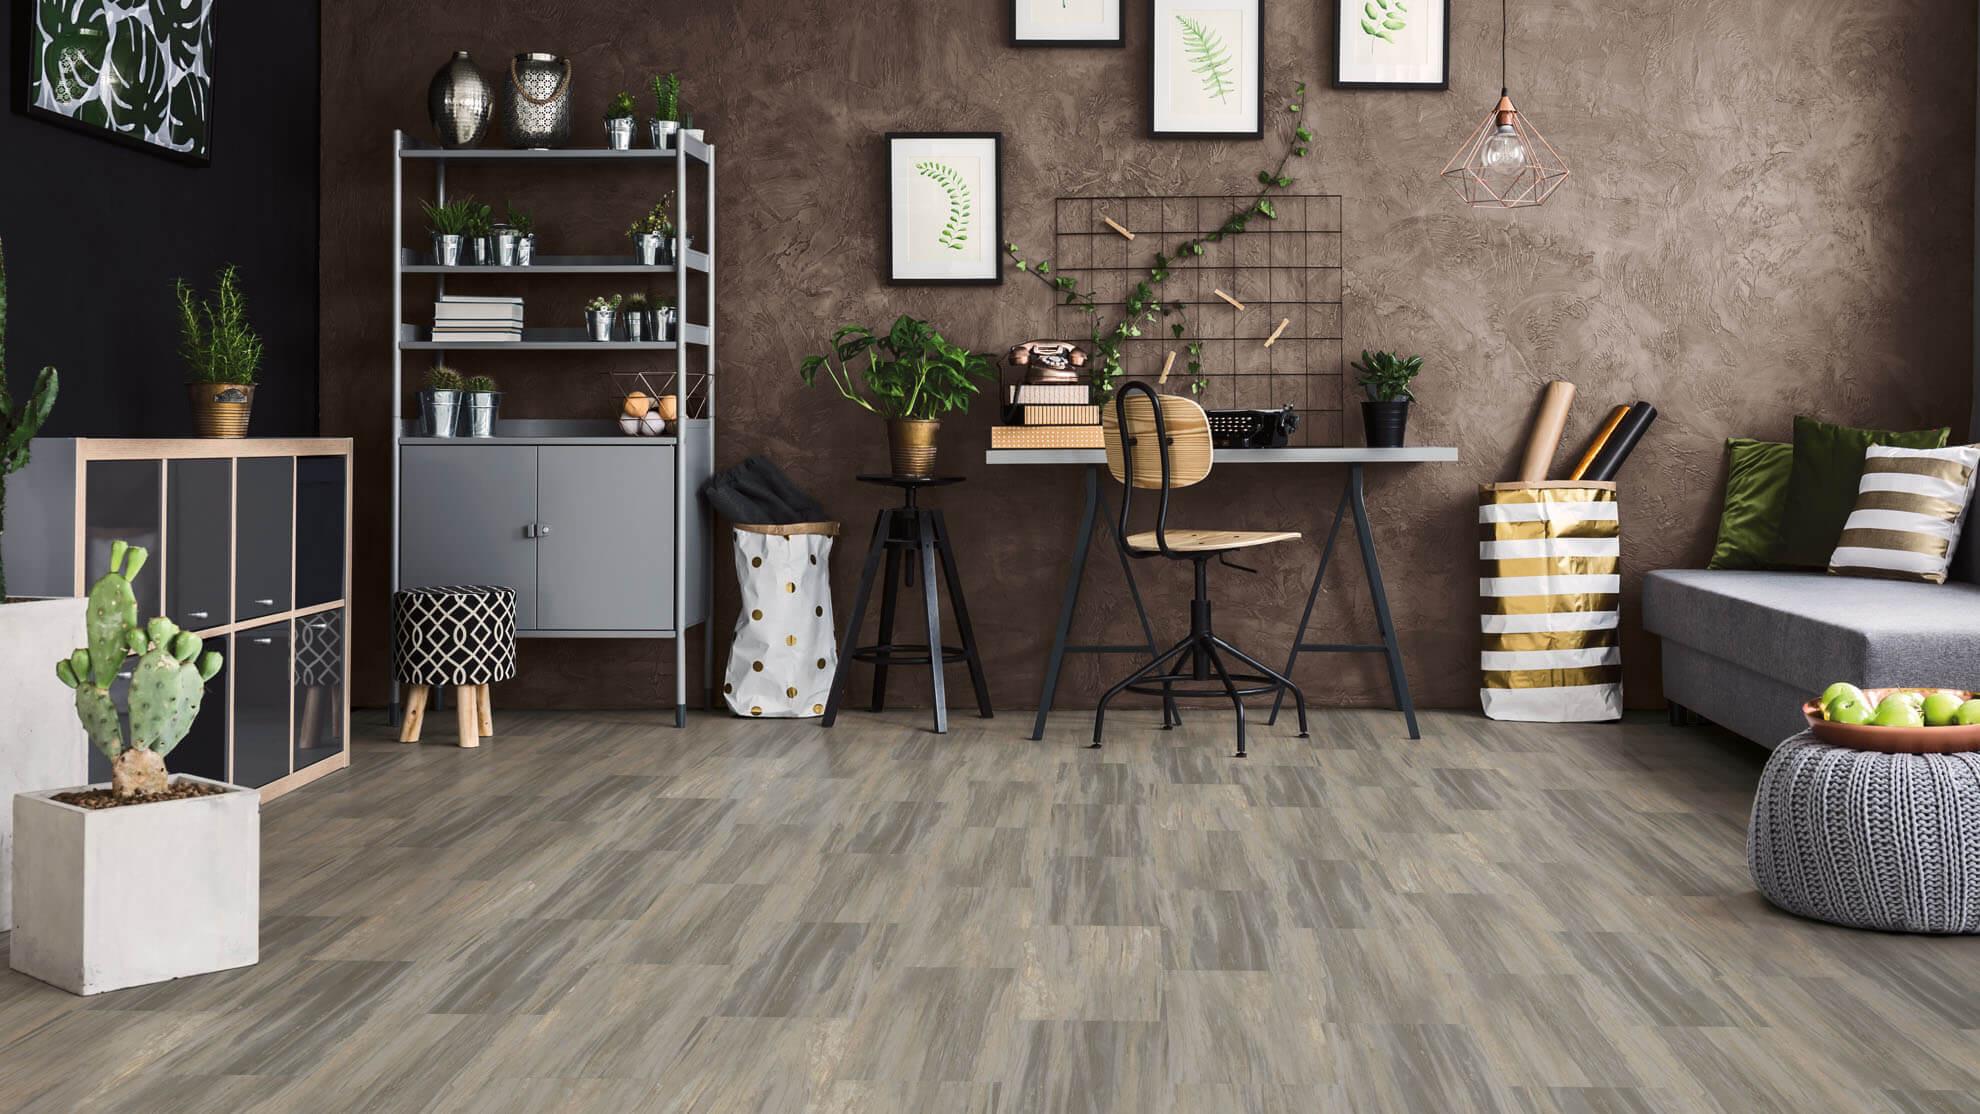 14 Fantastic Value Hardwood Flooring toronto 2021 free download value hardwood flooring toronto of earthwerks flooring with parkhill tile pkt 371